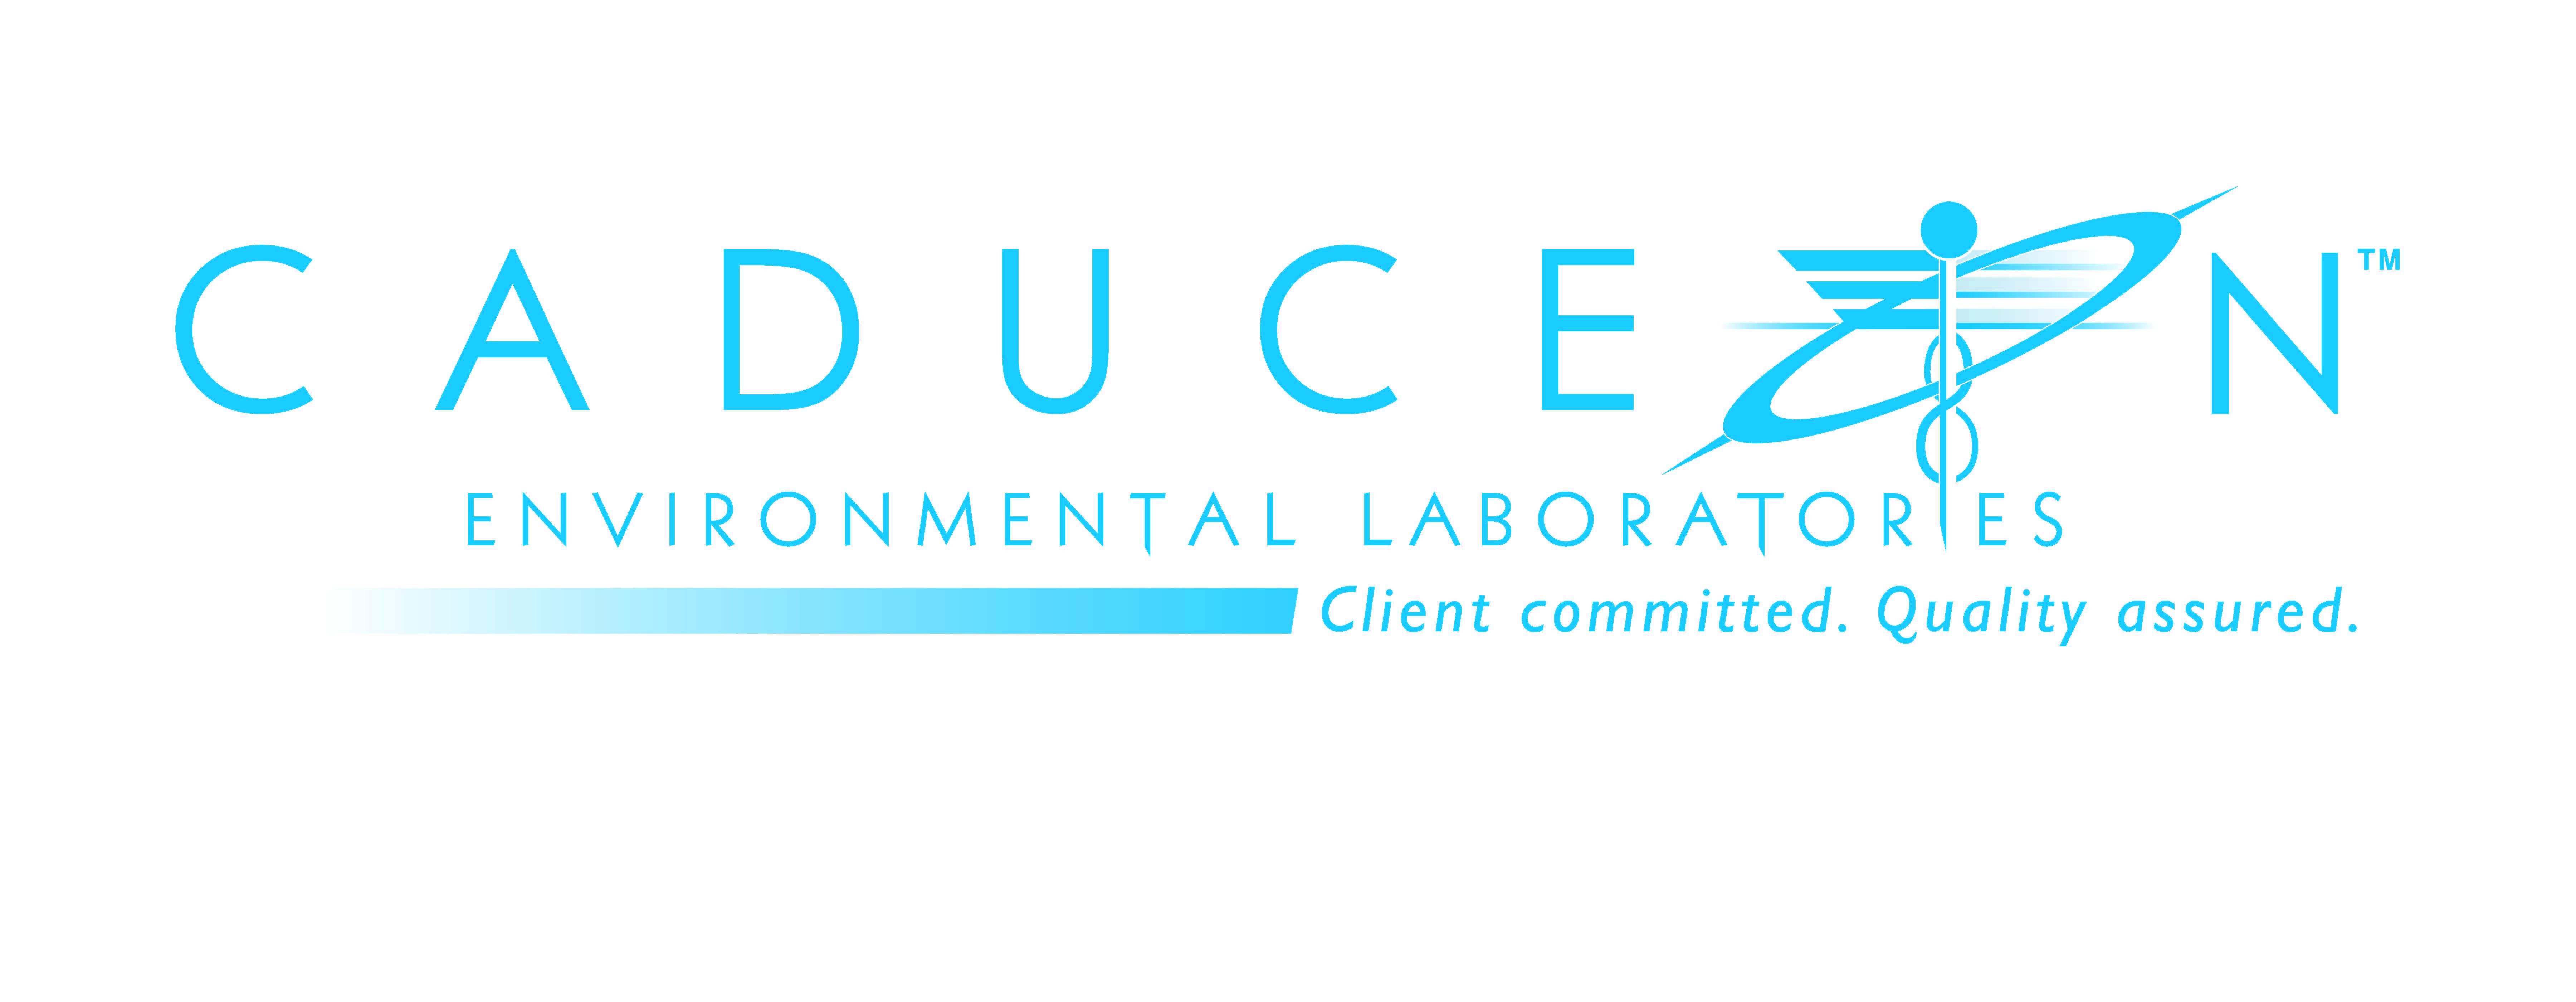 Caduceon Environmental Labs logo